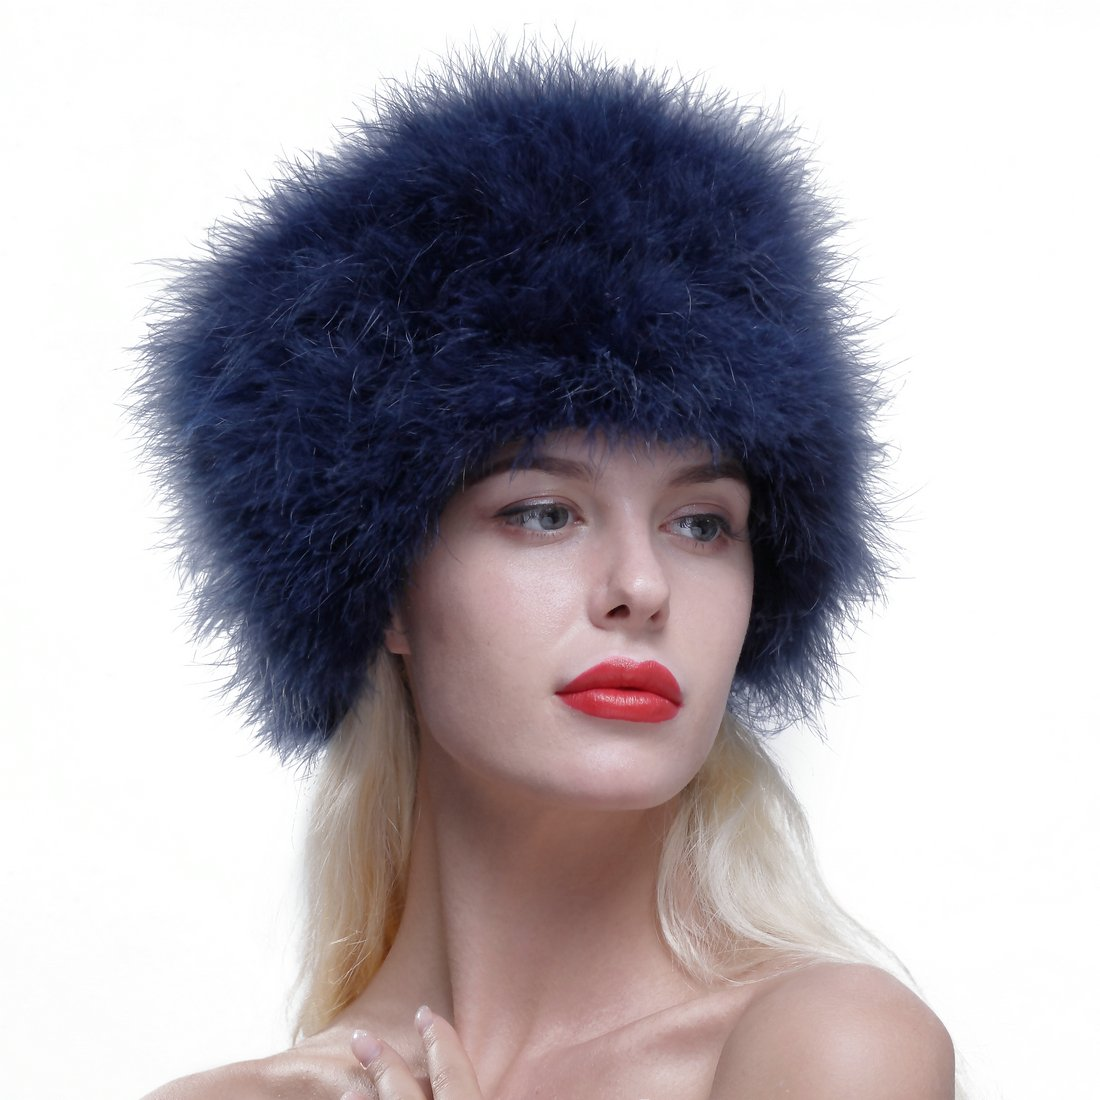 URSFUR Women Winter Fur Cap Genuine Ostrich Feather Fur Pill Box Hat Blue .Ltd. GCID-2016-H-06-1